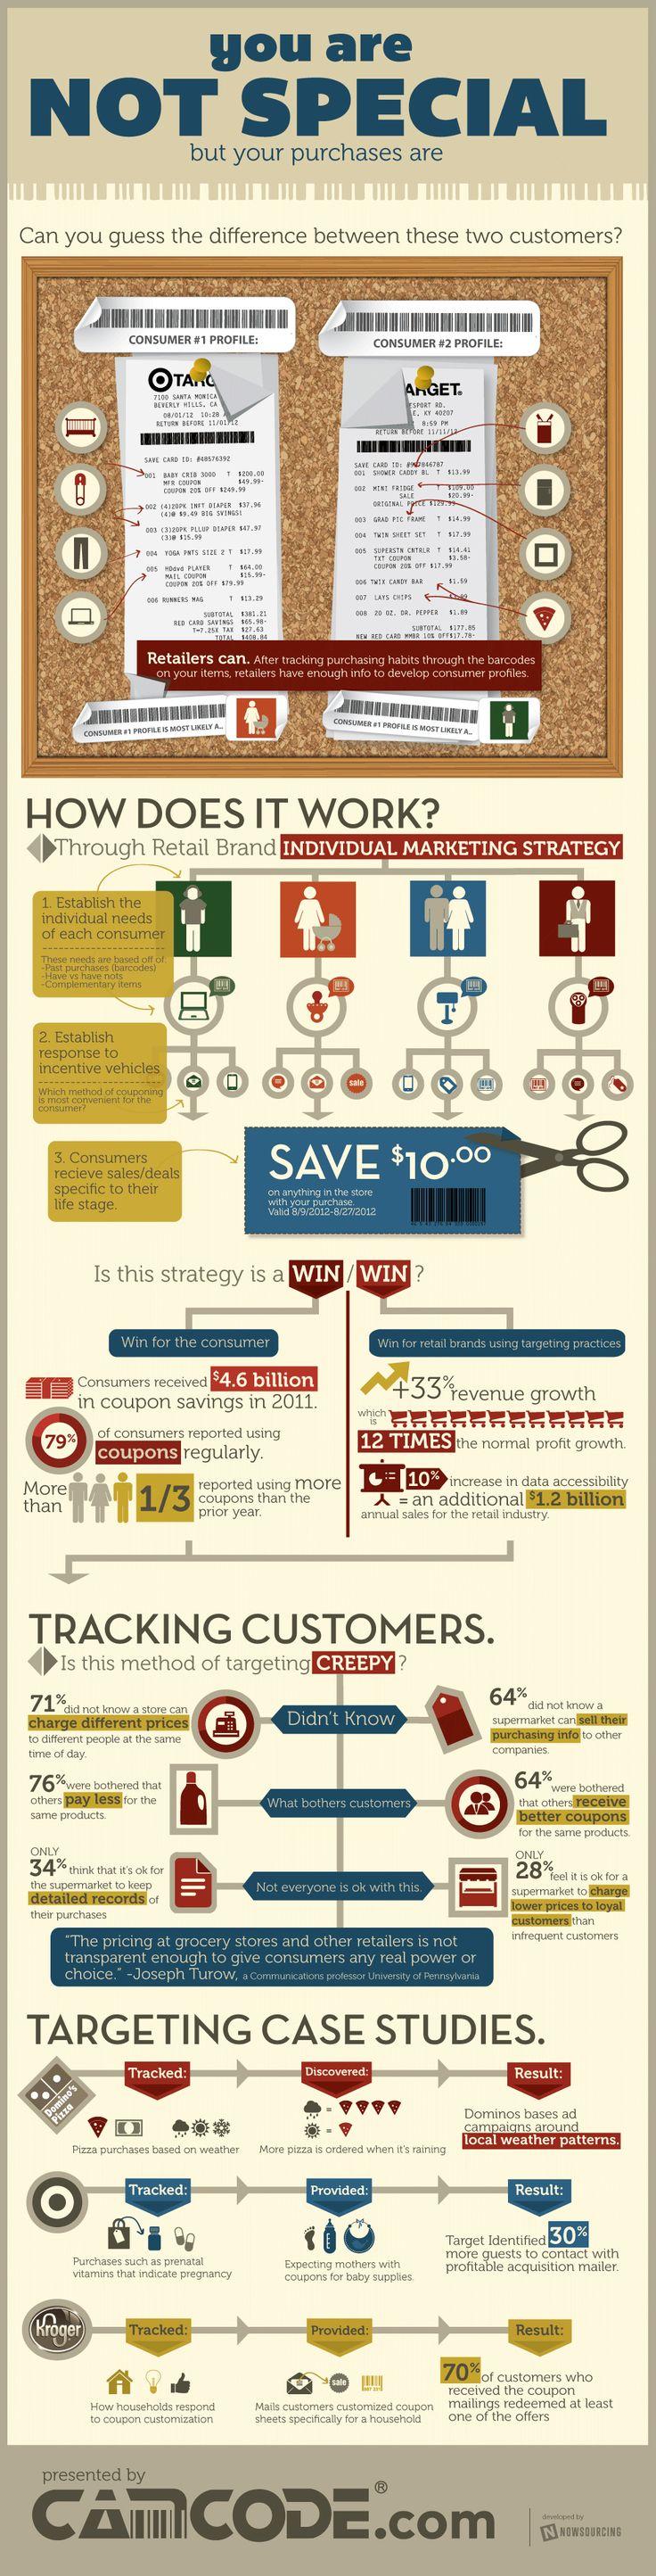 Customer Profiling: Creepy Sales Strategy Evolving